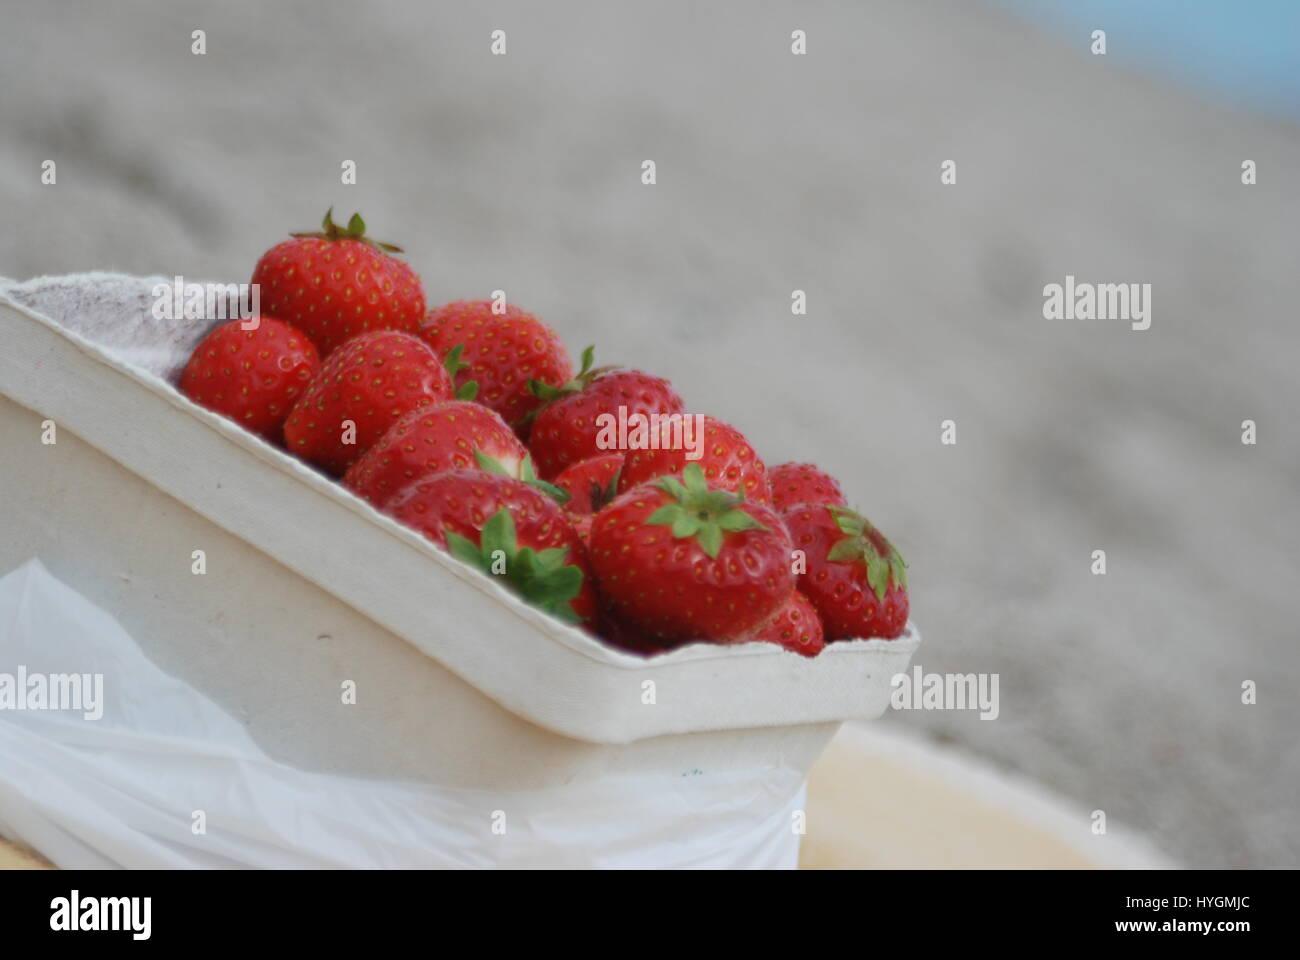 Silence Strawberries - Stock Image